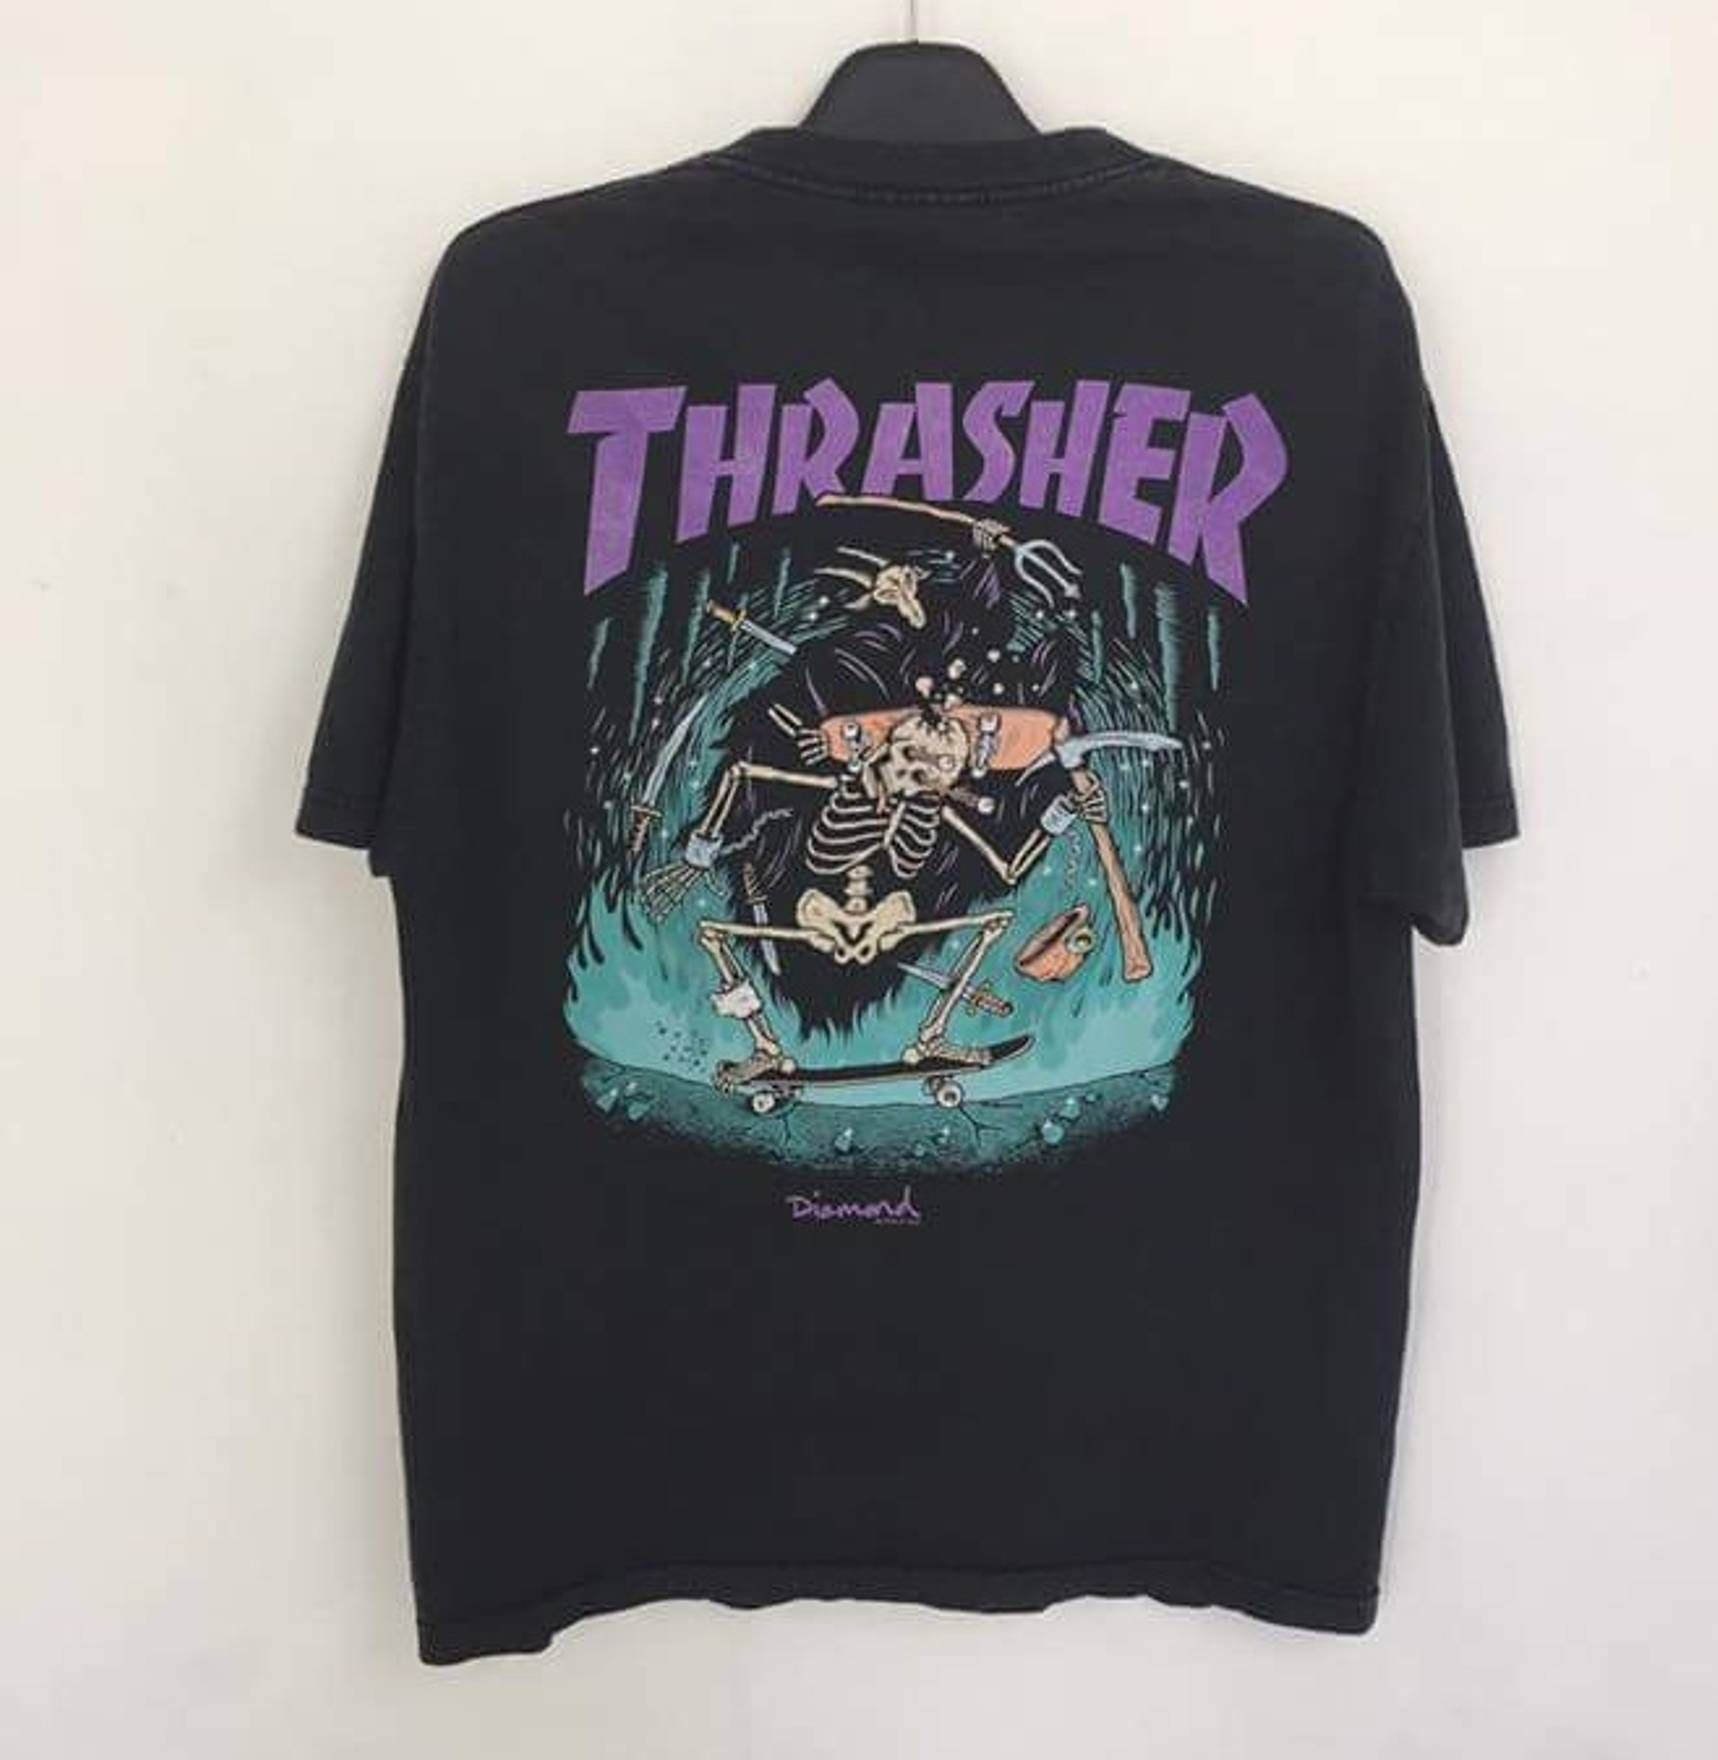 4ecd217308b6 Thrasher Thrasher x diamond skateboard tshirt big print..very good  condition stussy powell peralta santa cruz versace gucci fendi tommy polo Size  US L / EU ...